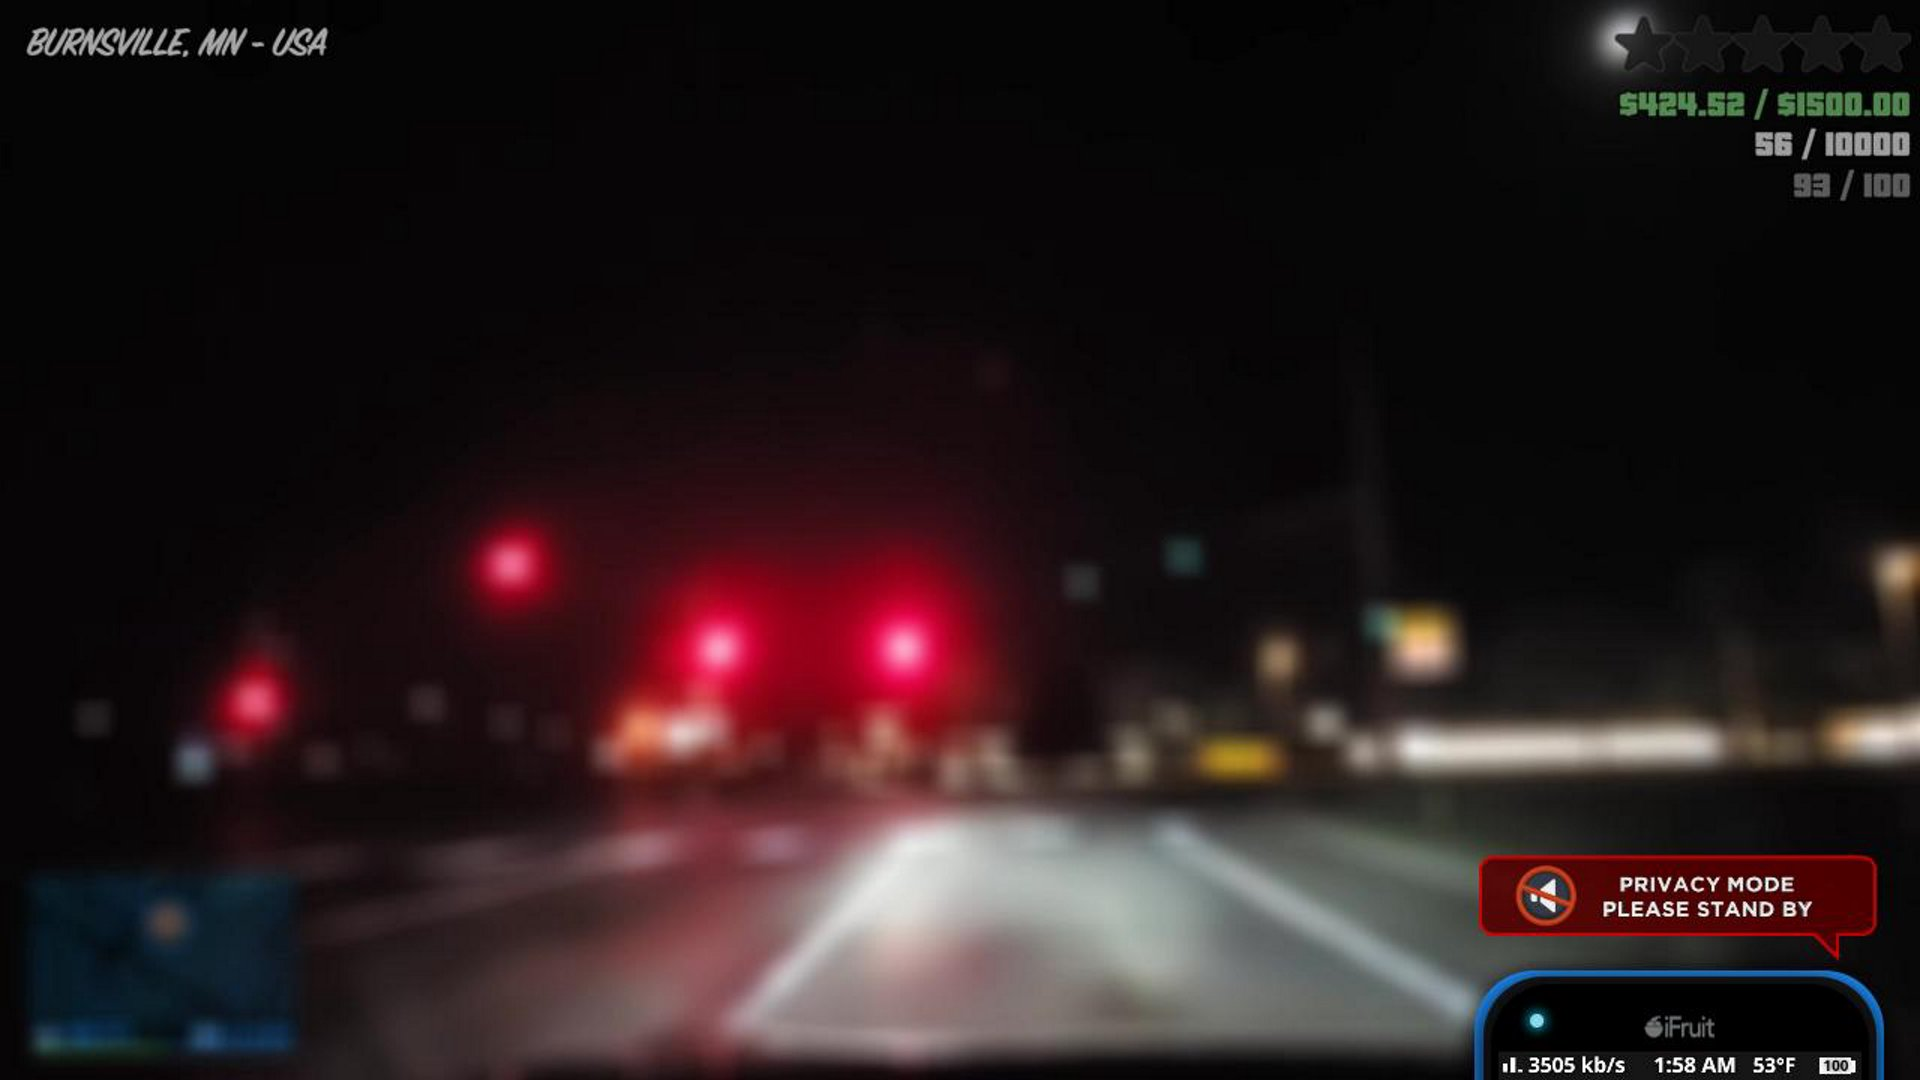 uber-eats-chill-mnusa-help-irl-livewell-data-just-chatting-0259-https-t-co-0qezbhd8w8-https-t-co-qaxryqkevr